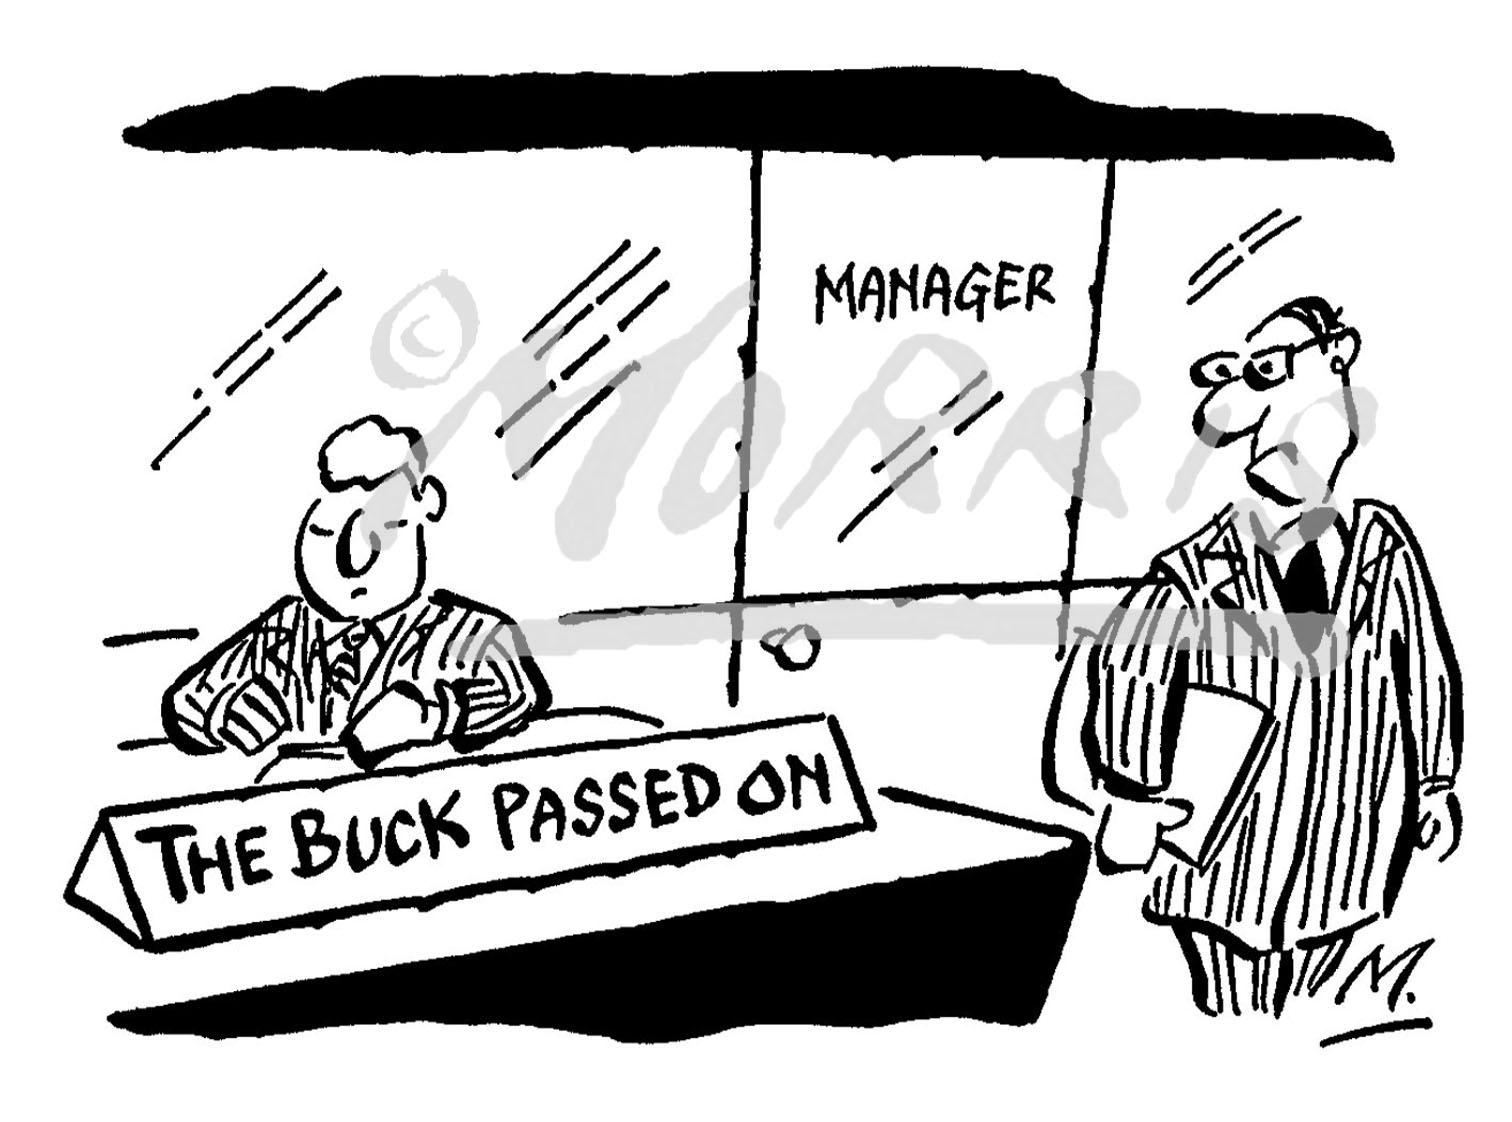 Employee management comic cartoon Ref: 0668bw